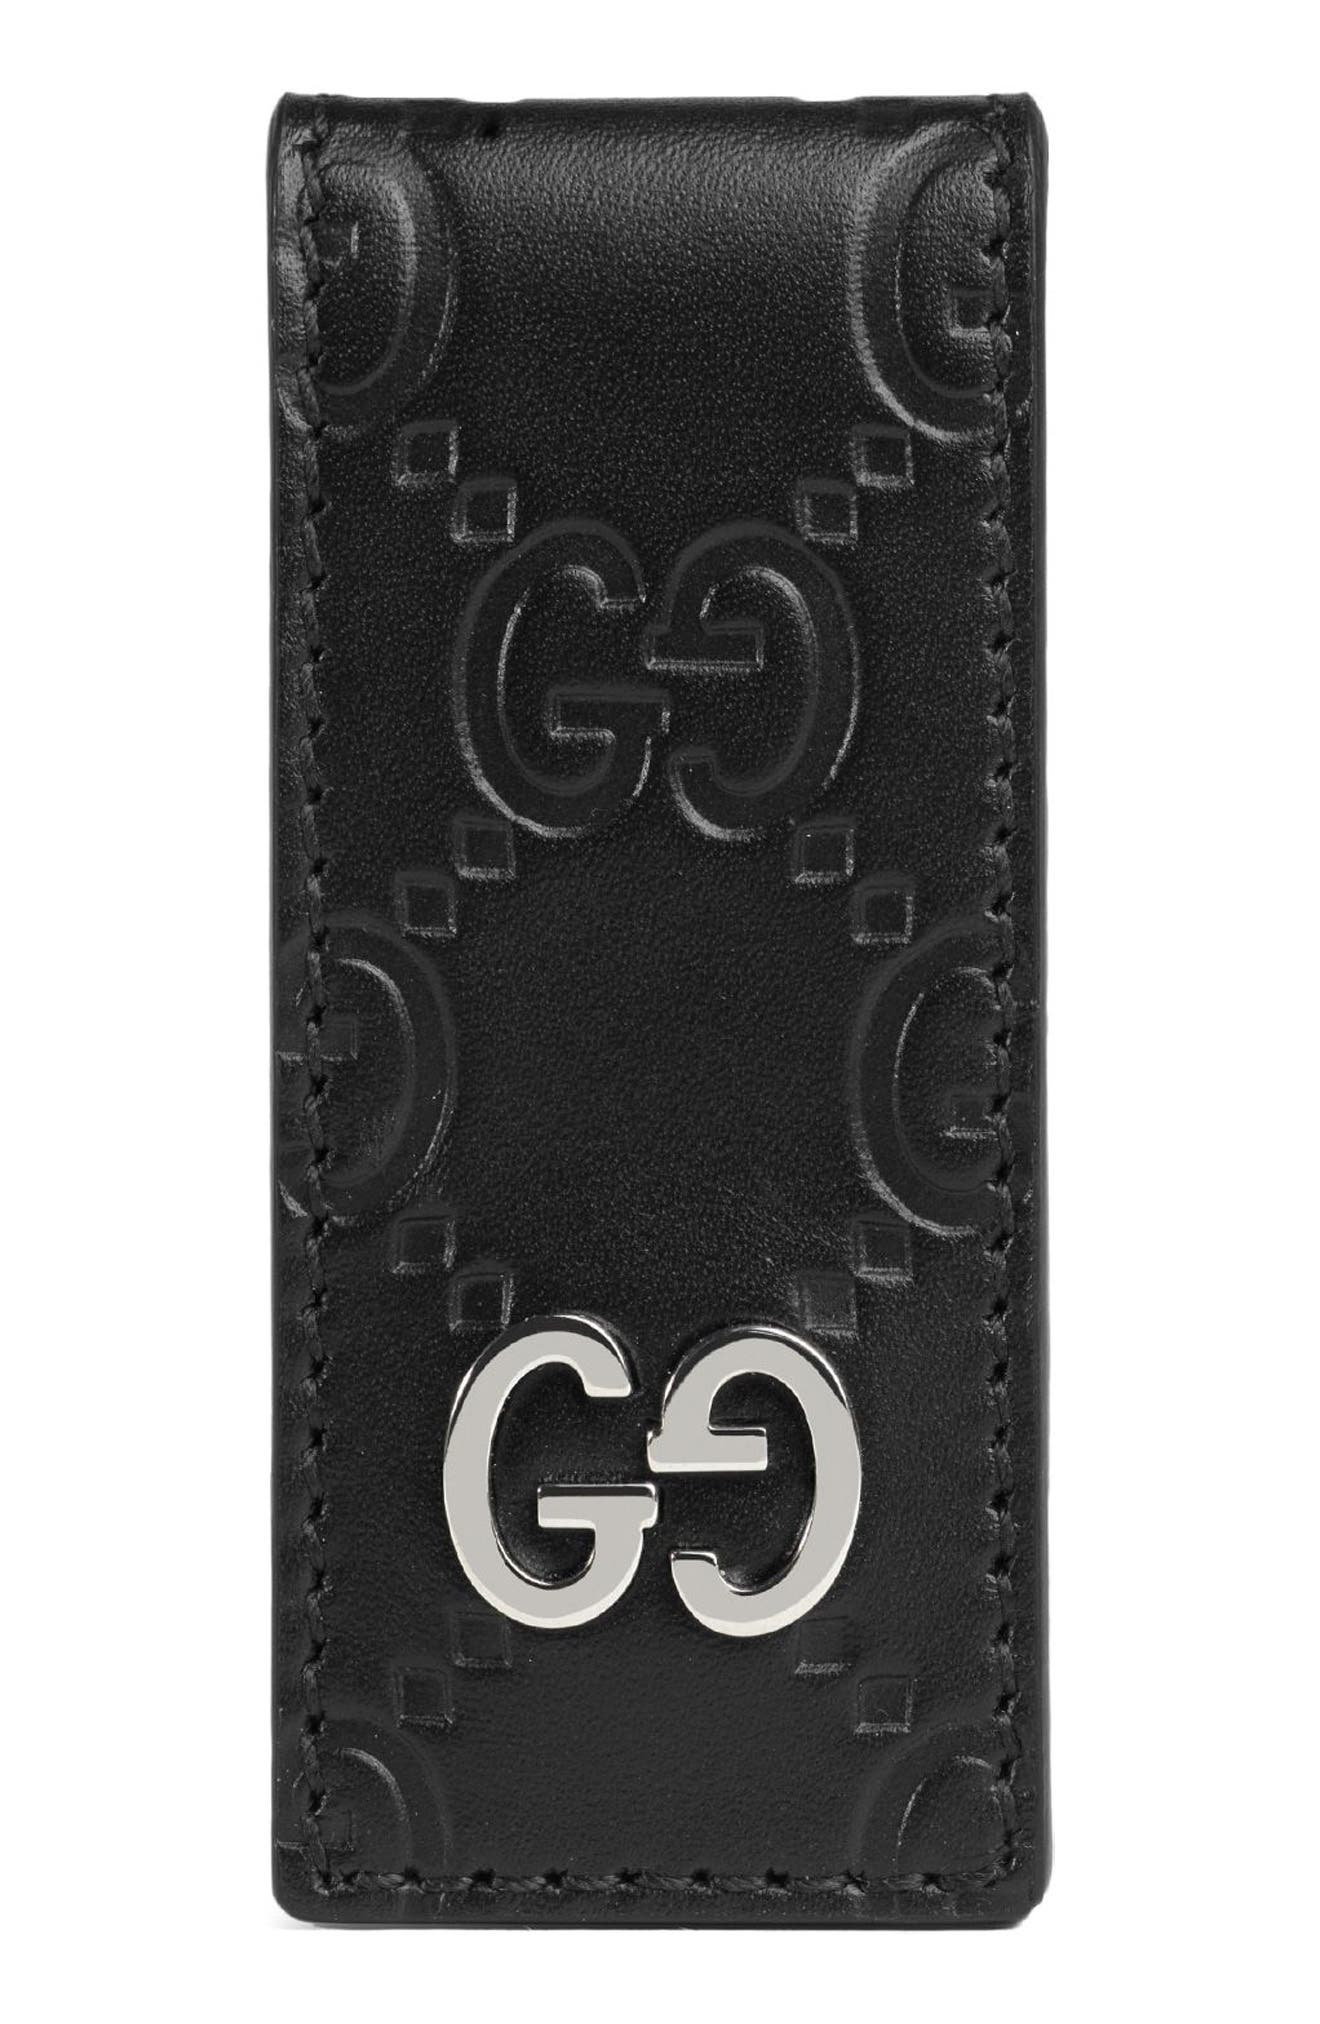 GG Signature Leather Money Clip,                             Main thumbnail 1, color,                             Black